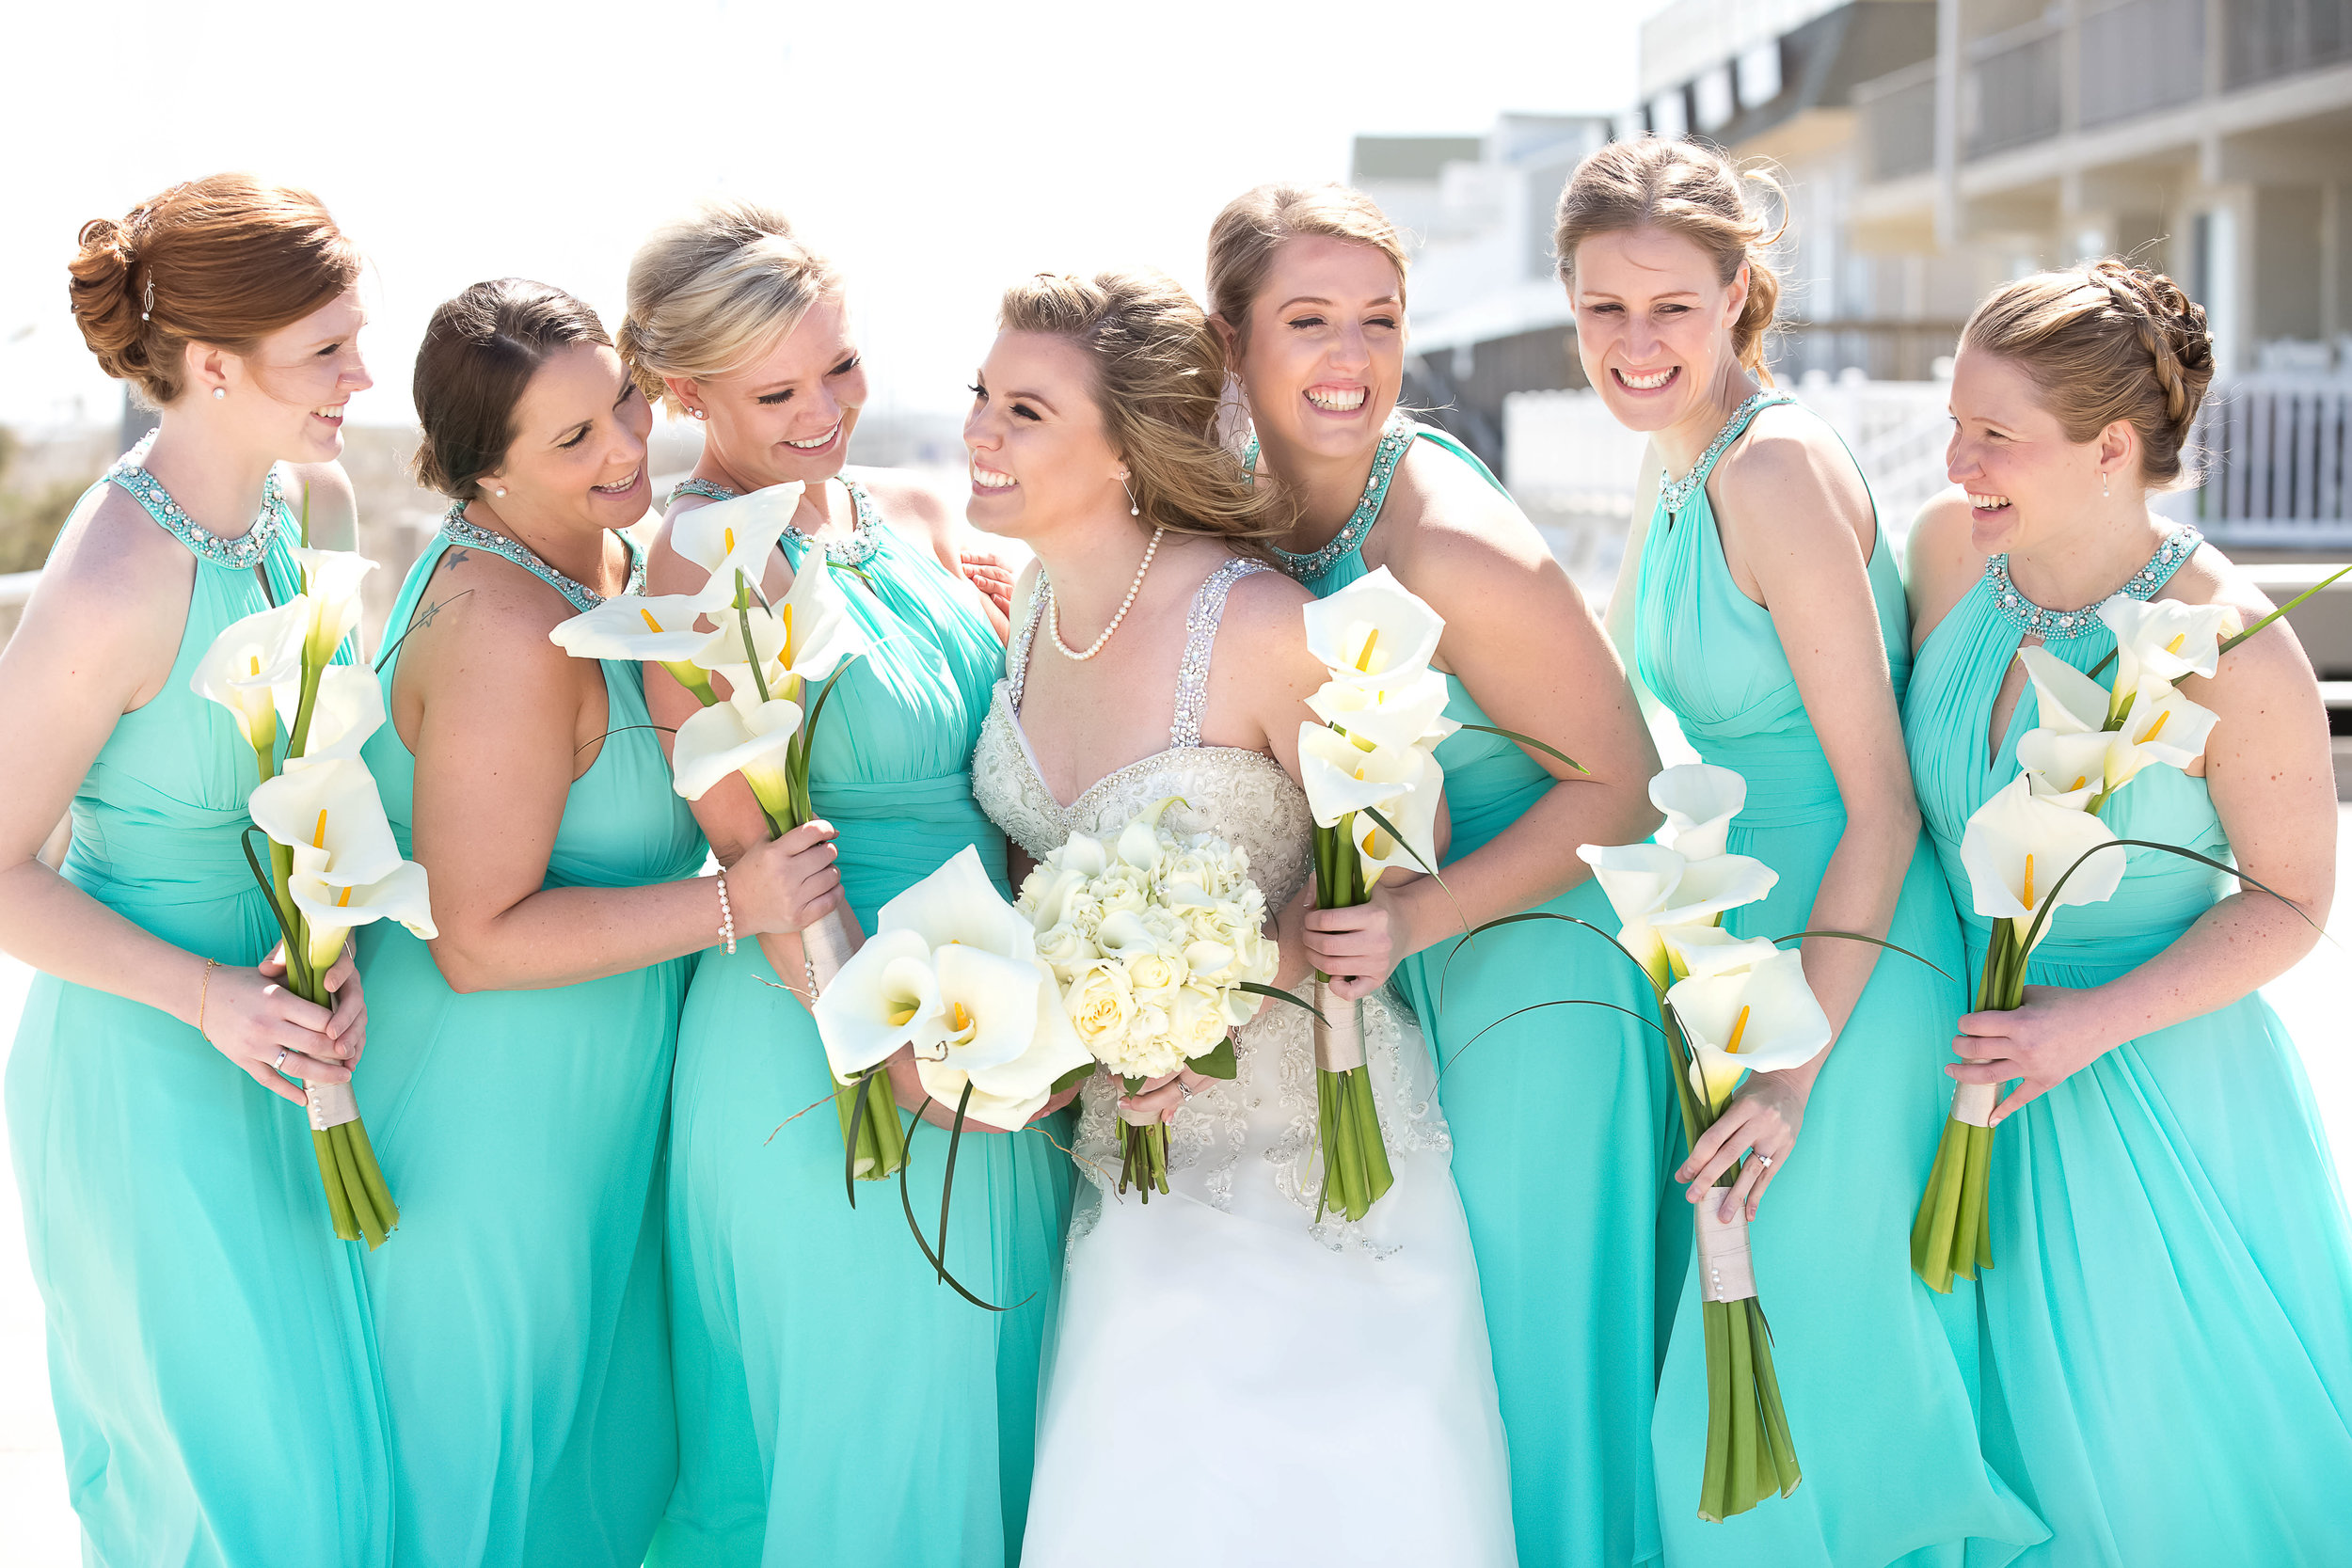 Burnell-Matthews Wedding_0434-Edit.jpg